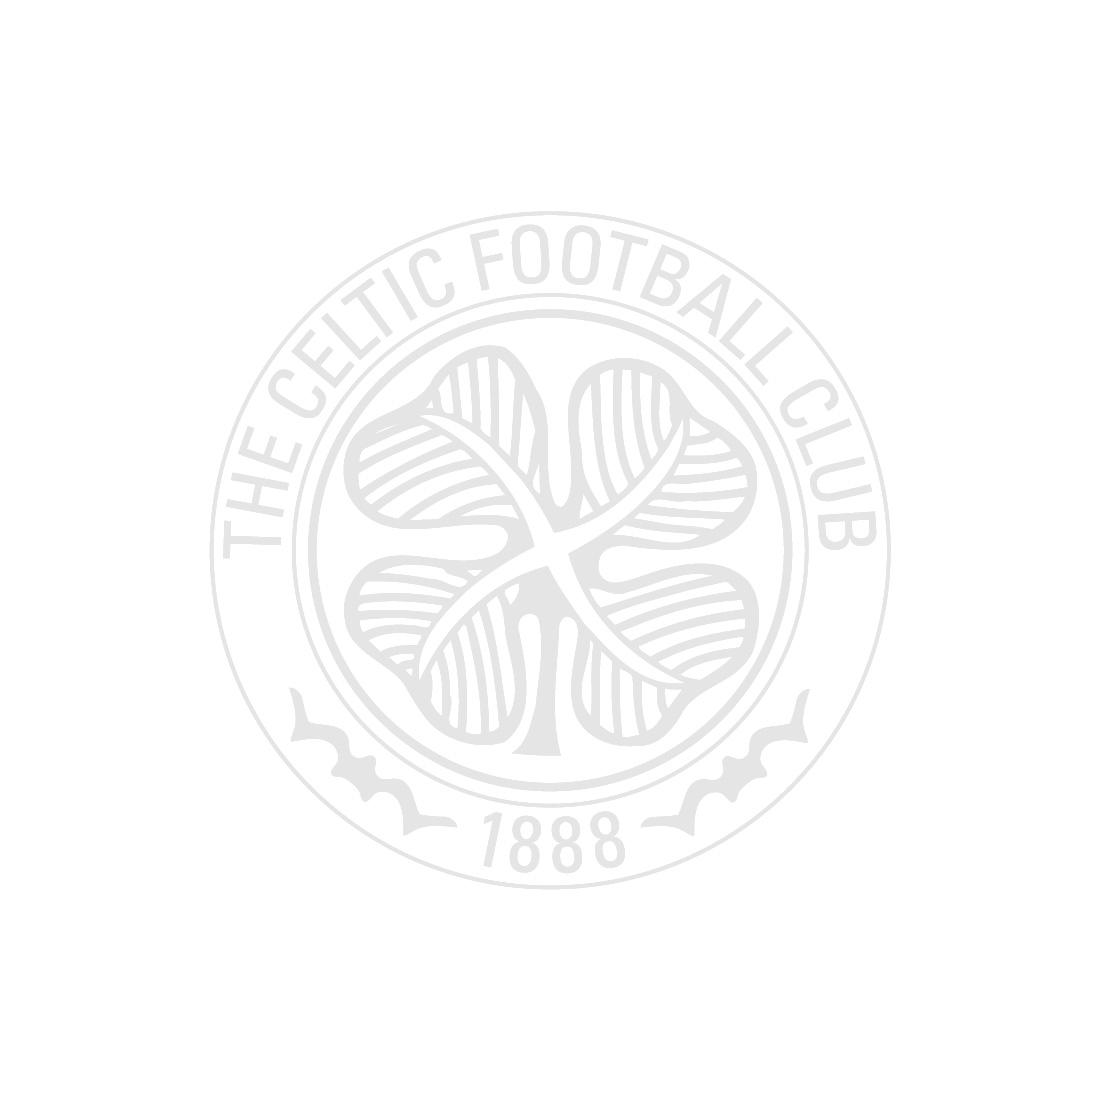 Celtic Raised Rubber Line Print Graphic T-shirt